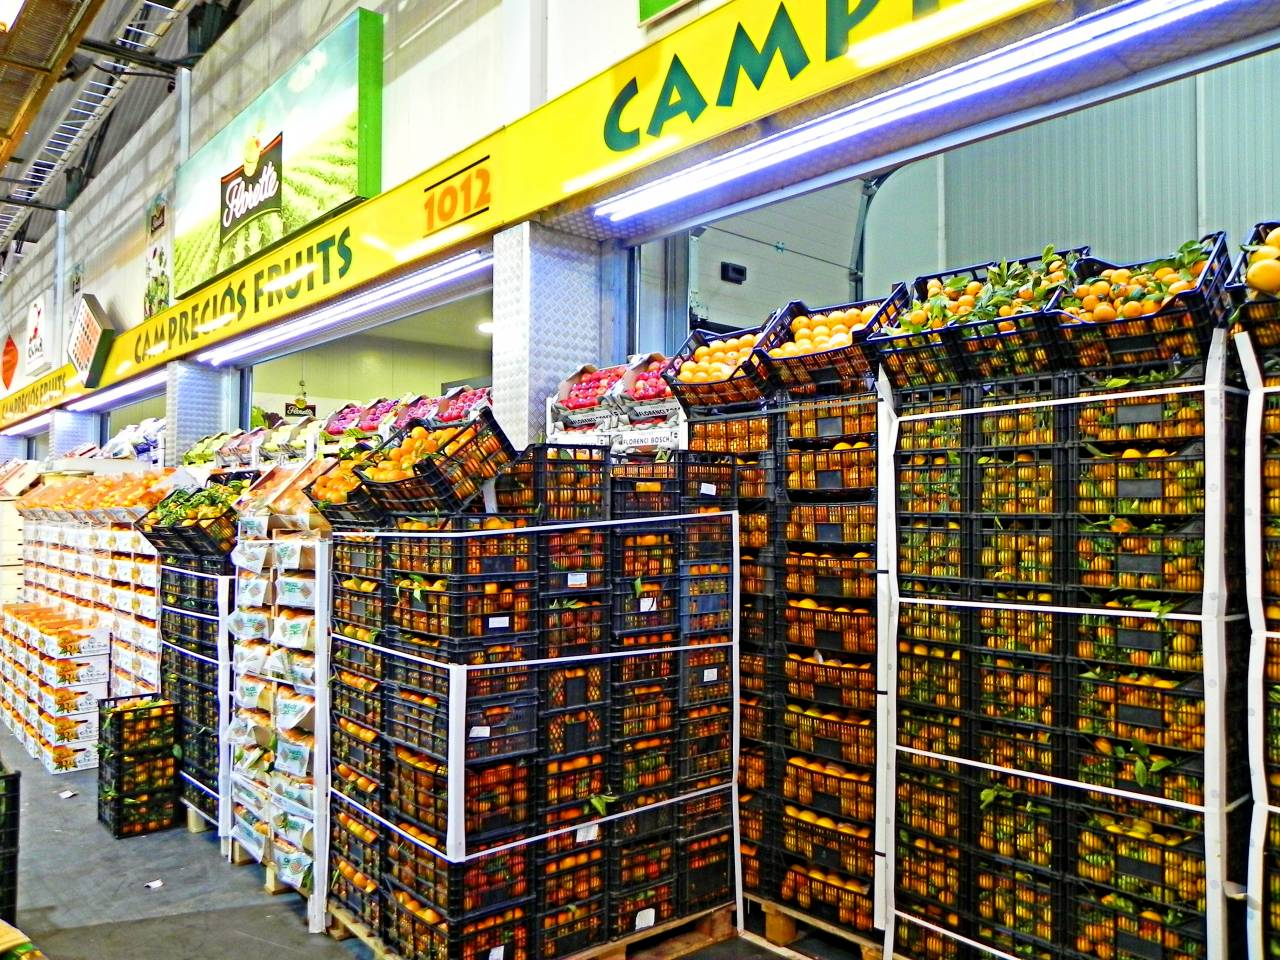 Camprecios Fruits - Historia